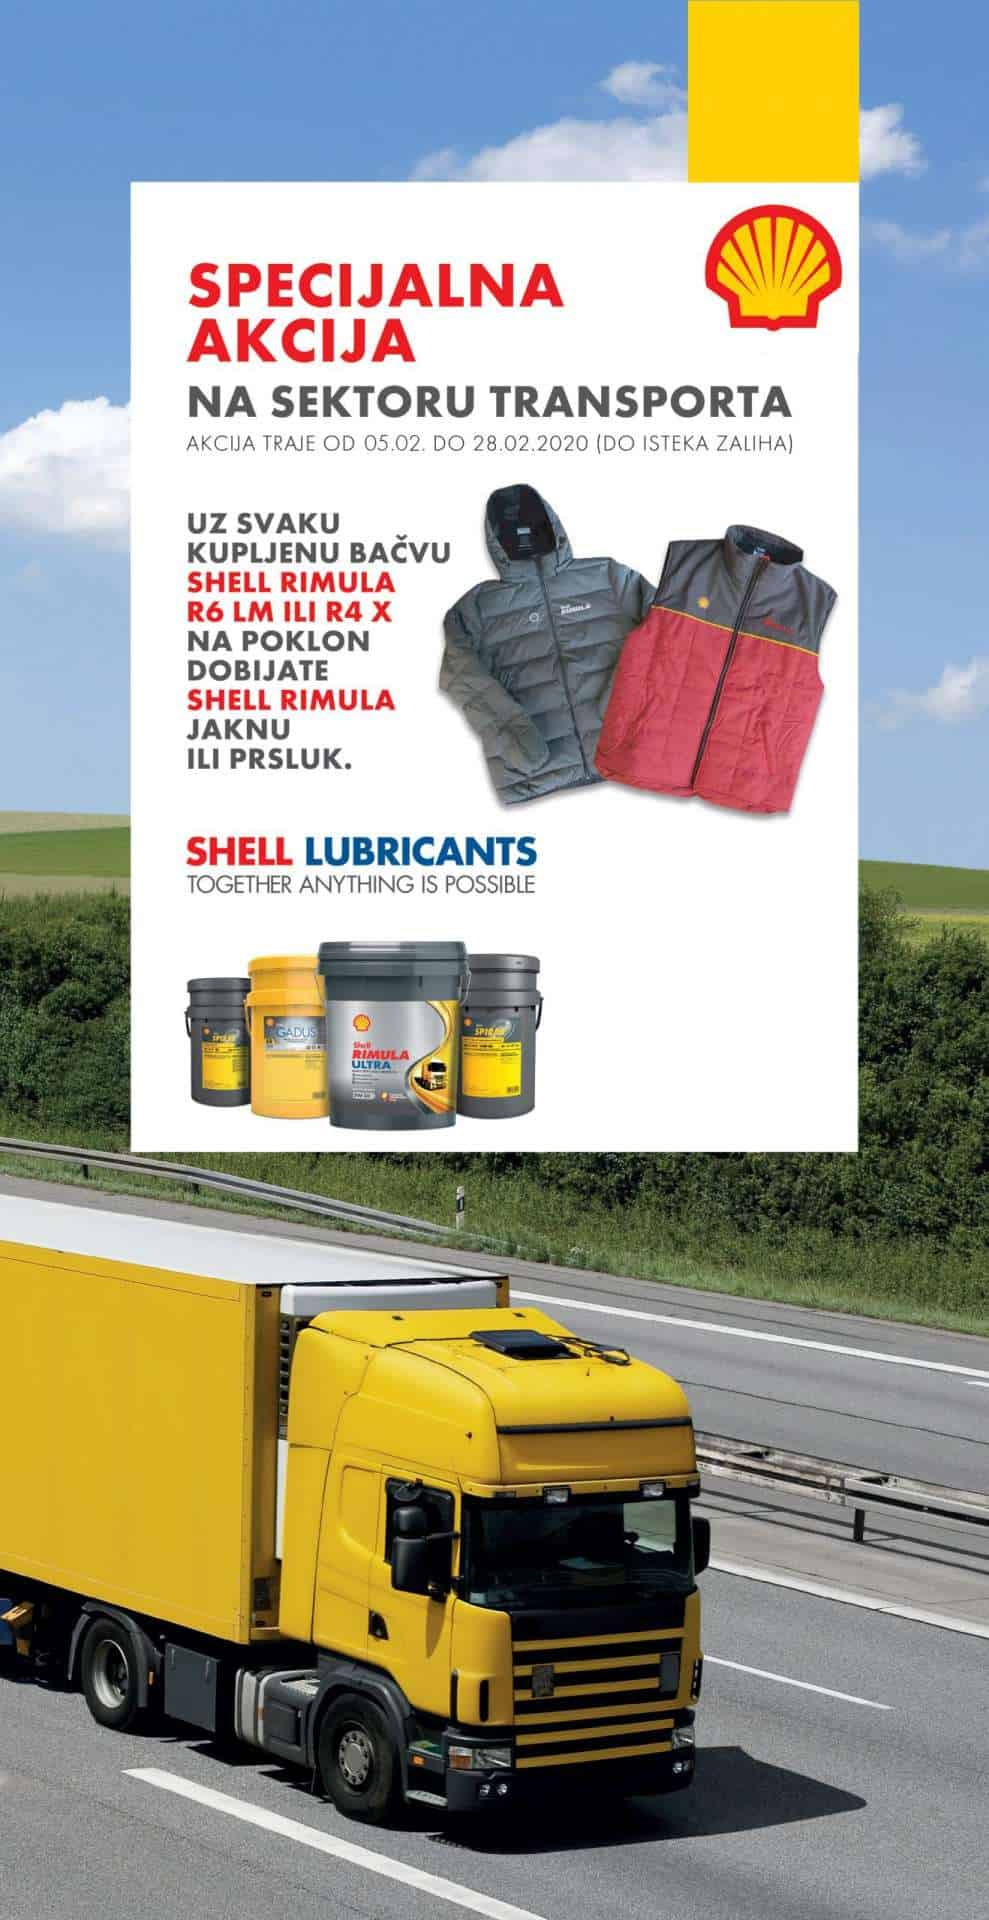 Shell Driveline kampanja, motorna ulja, kamion, shell prsluk, shell ranac, Shell Rimula ulja, Shell Rimula R4 X